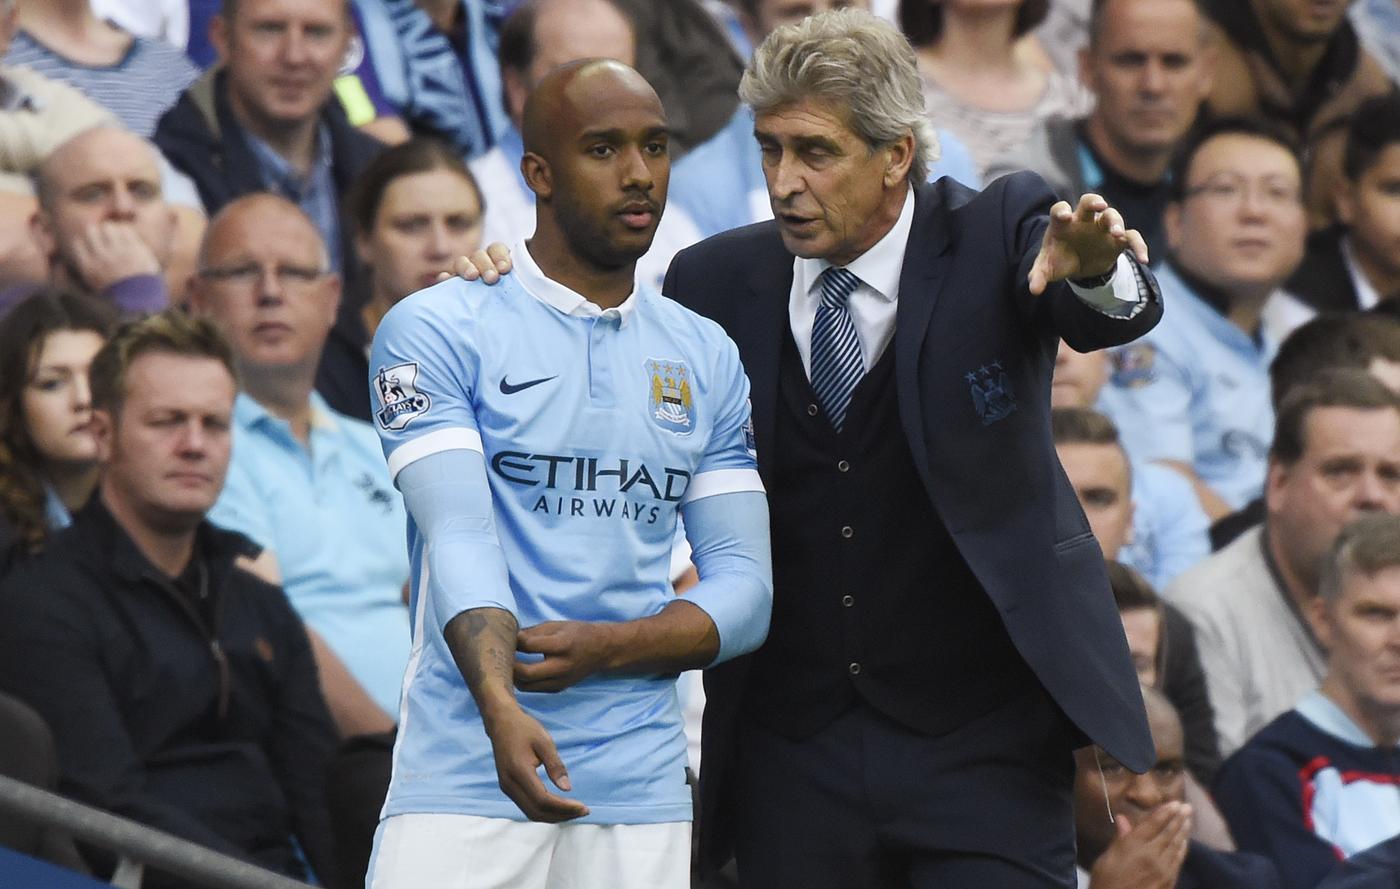 Manchester City boss Manuel Pellegrini doesn't think Aston Villa fans will boo Fabian Delph